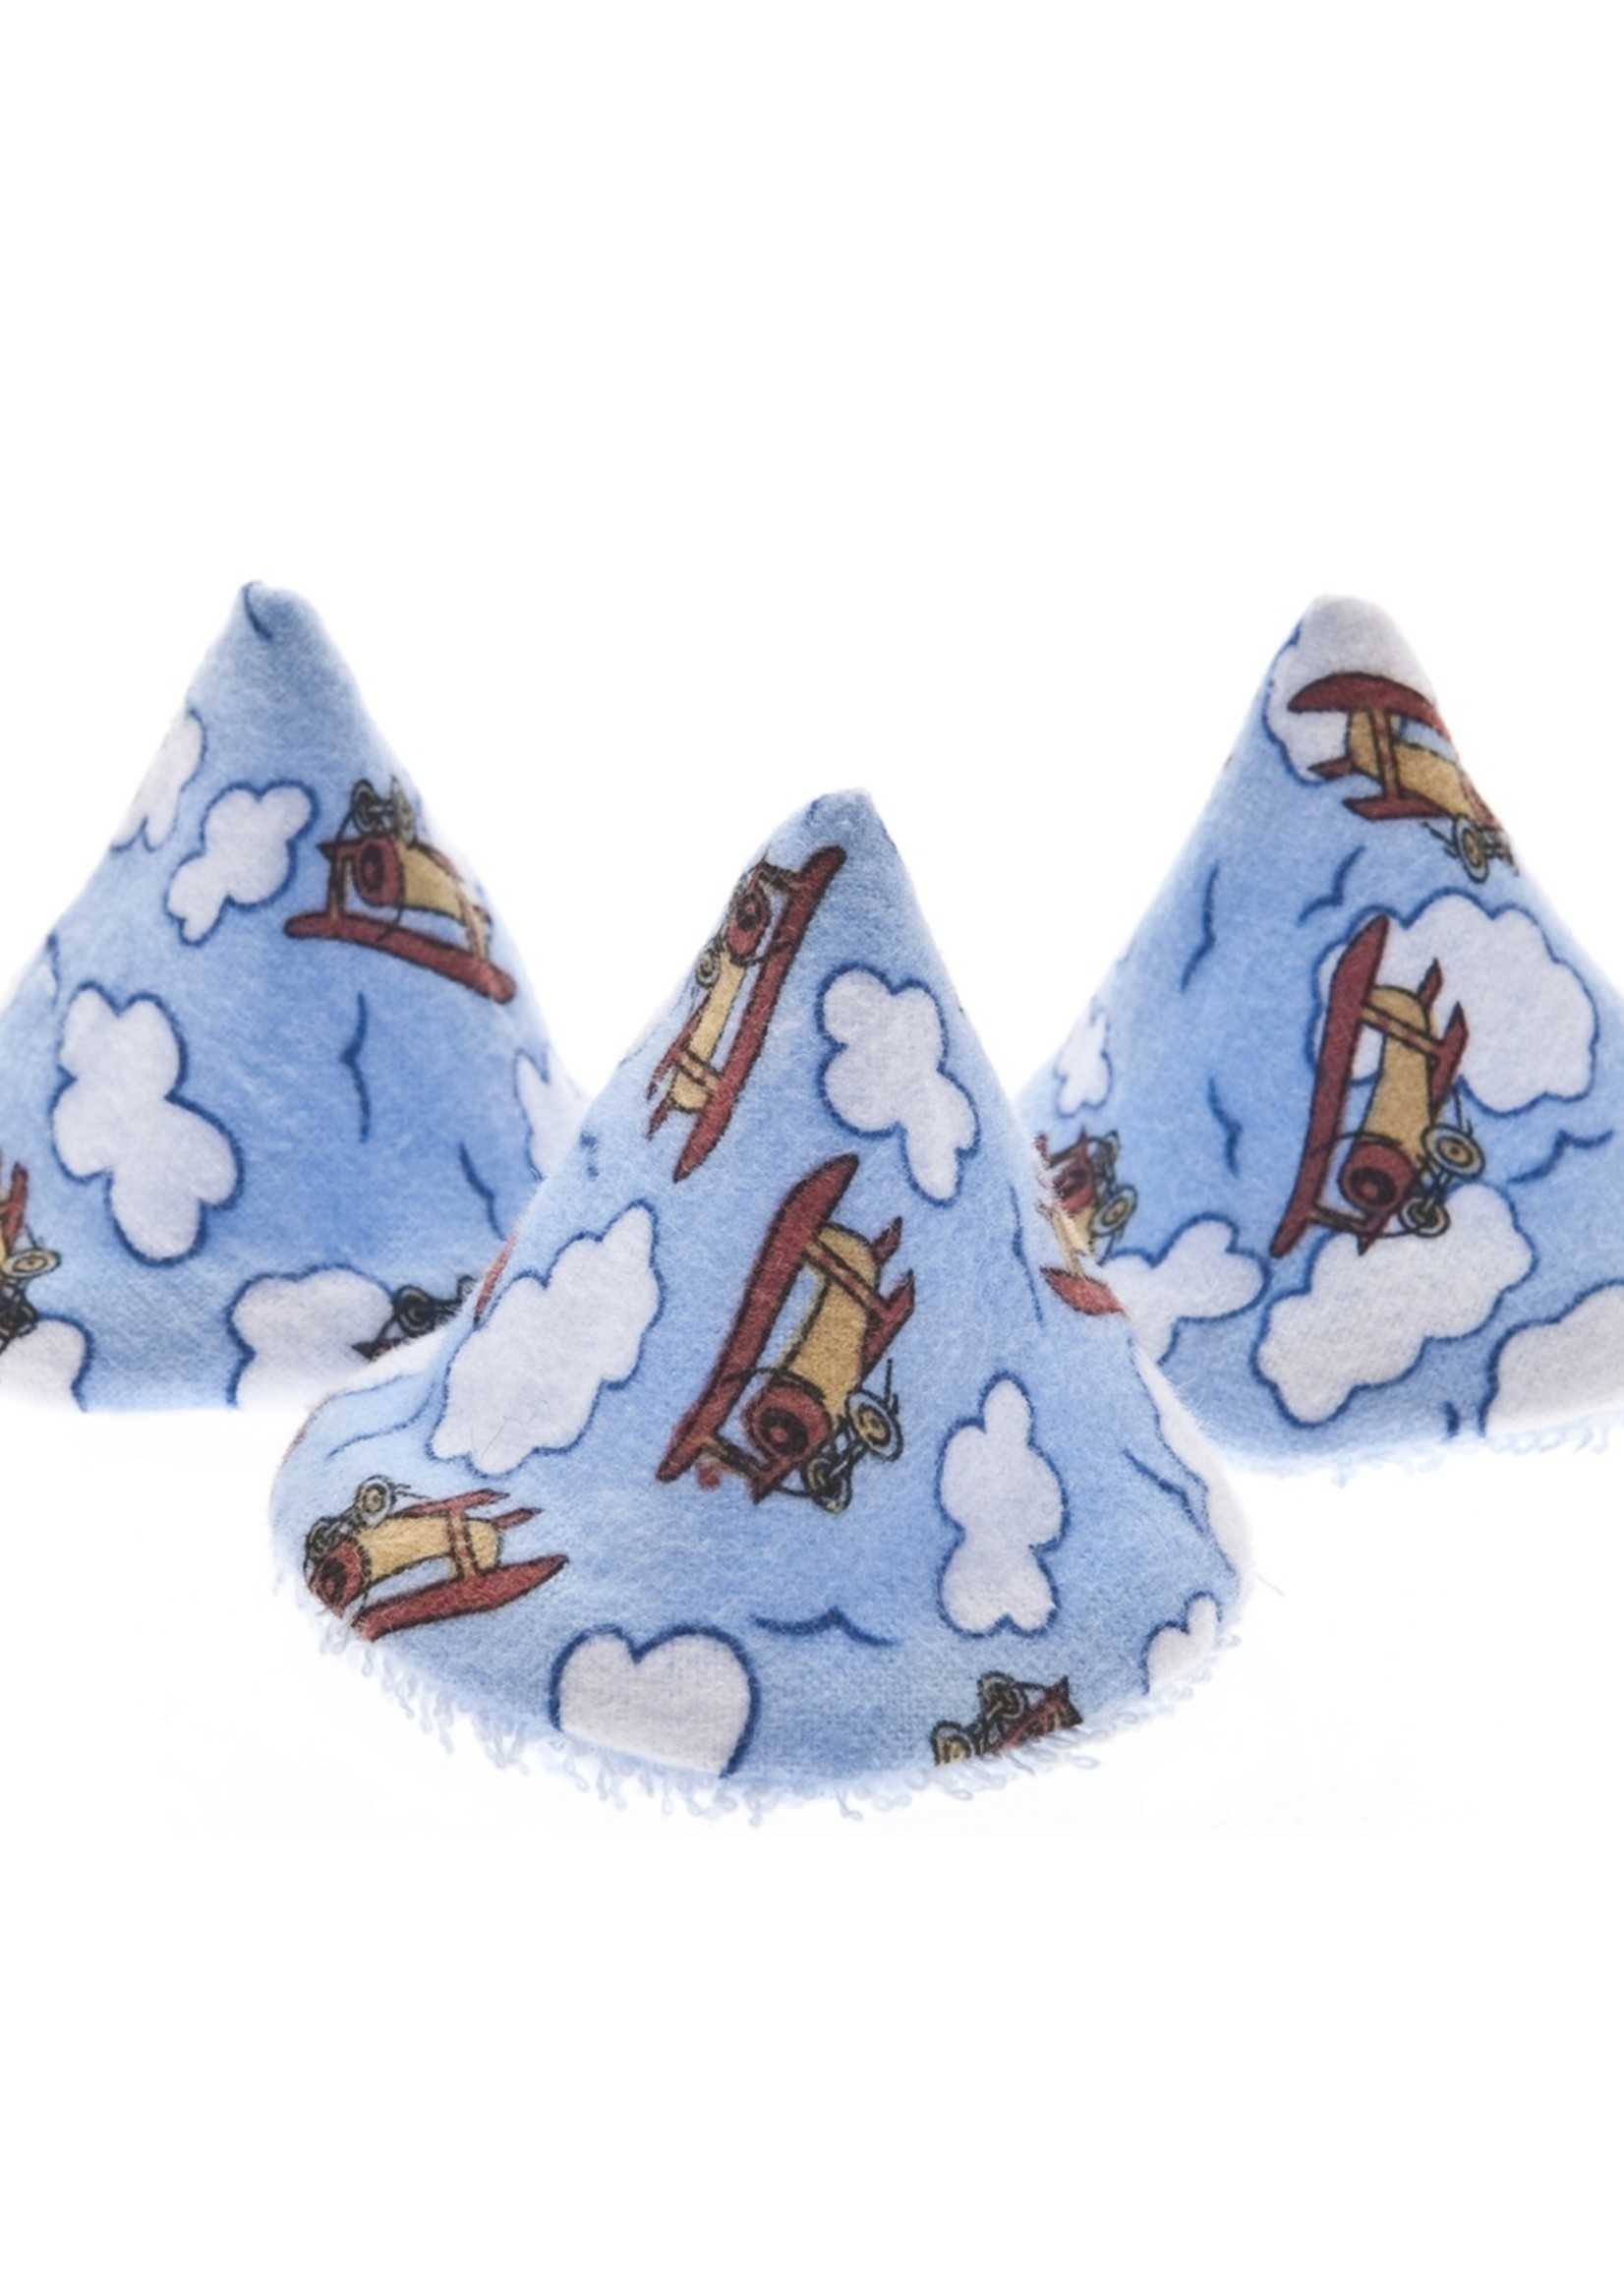 beba bean Pee-Pee Teepee Airplanes